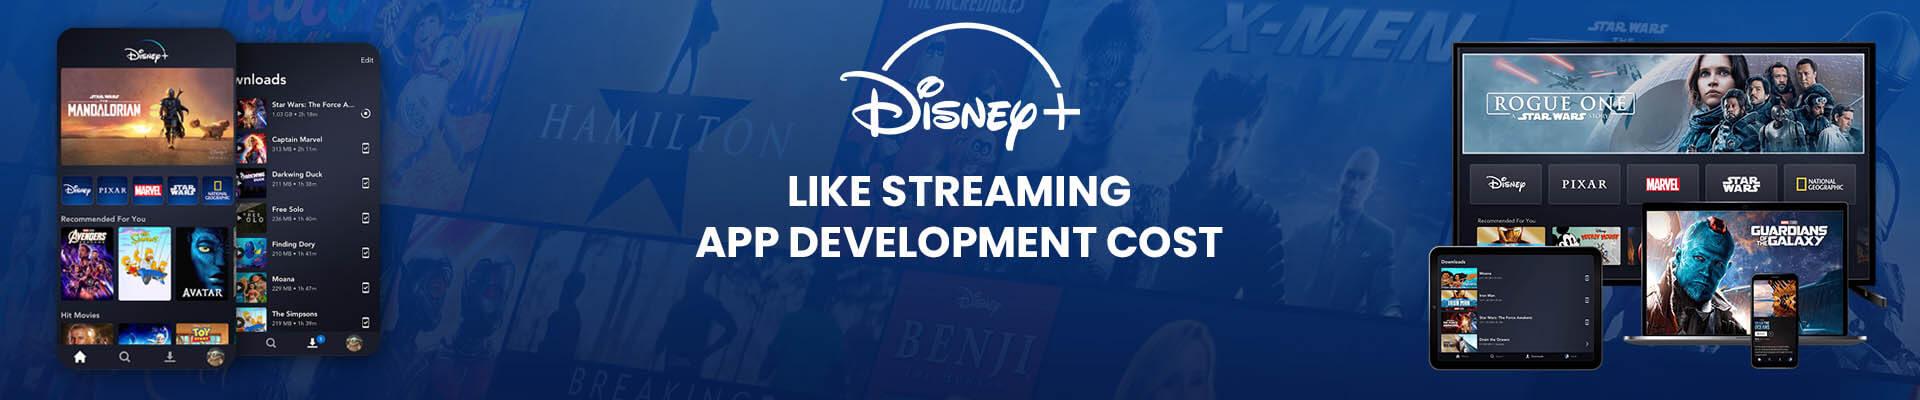 Disney+ streaming app development cost